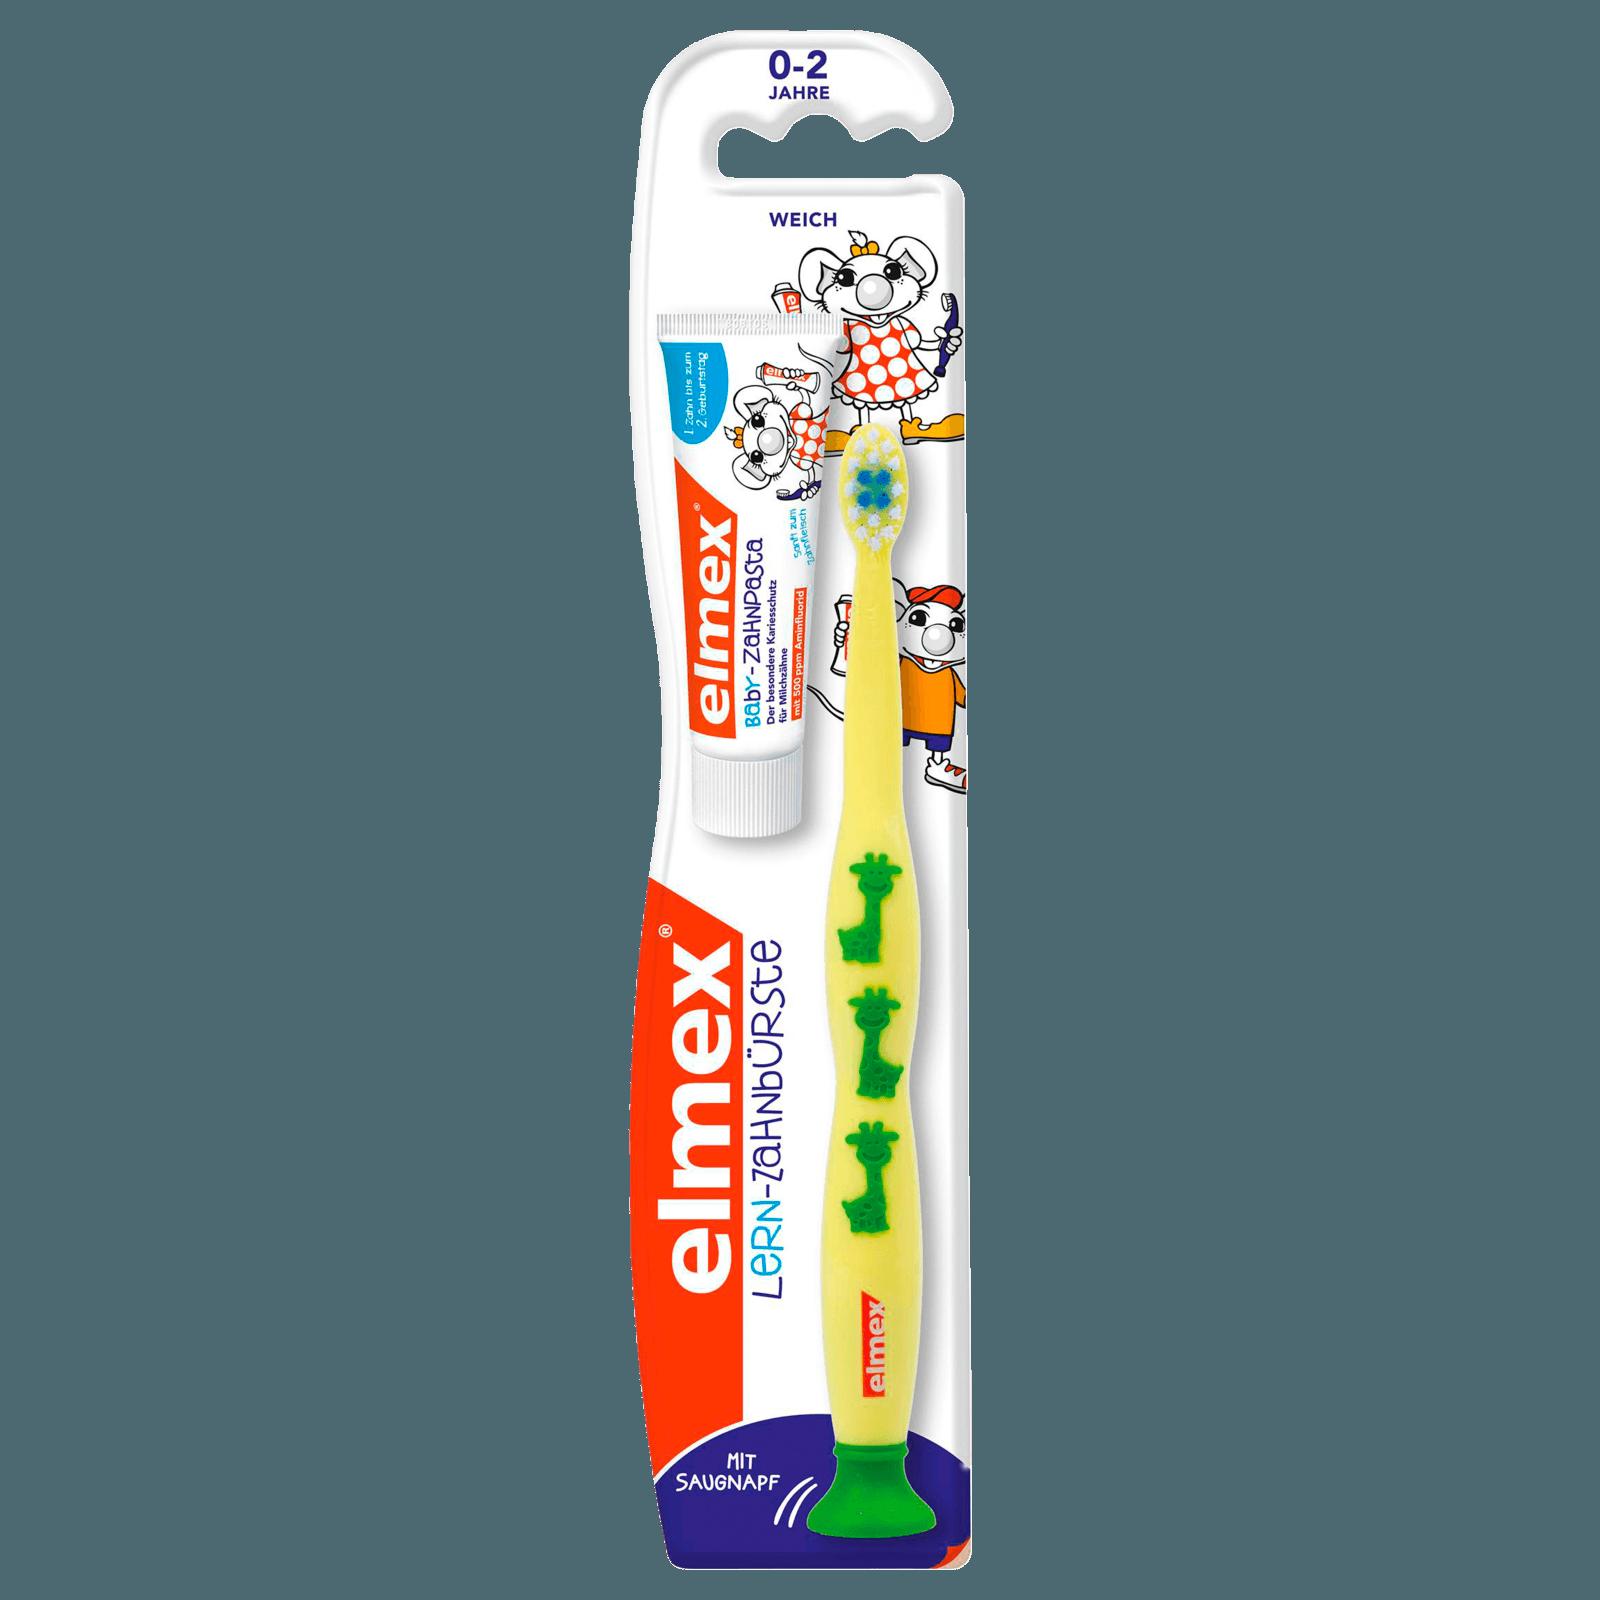 Elmex Lern-Zahnbürste + elmex Kinder-Zahnpasta 12ml